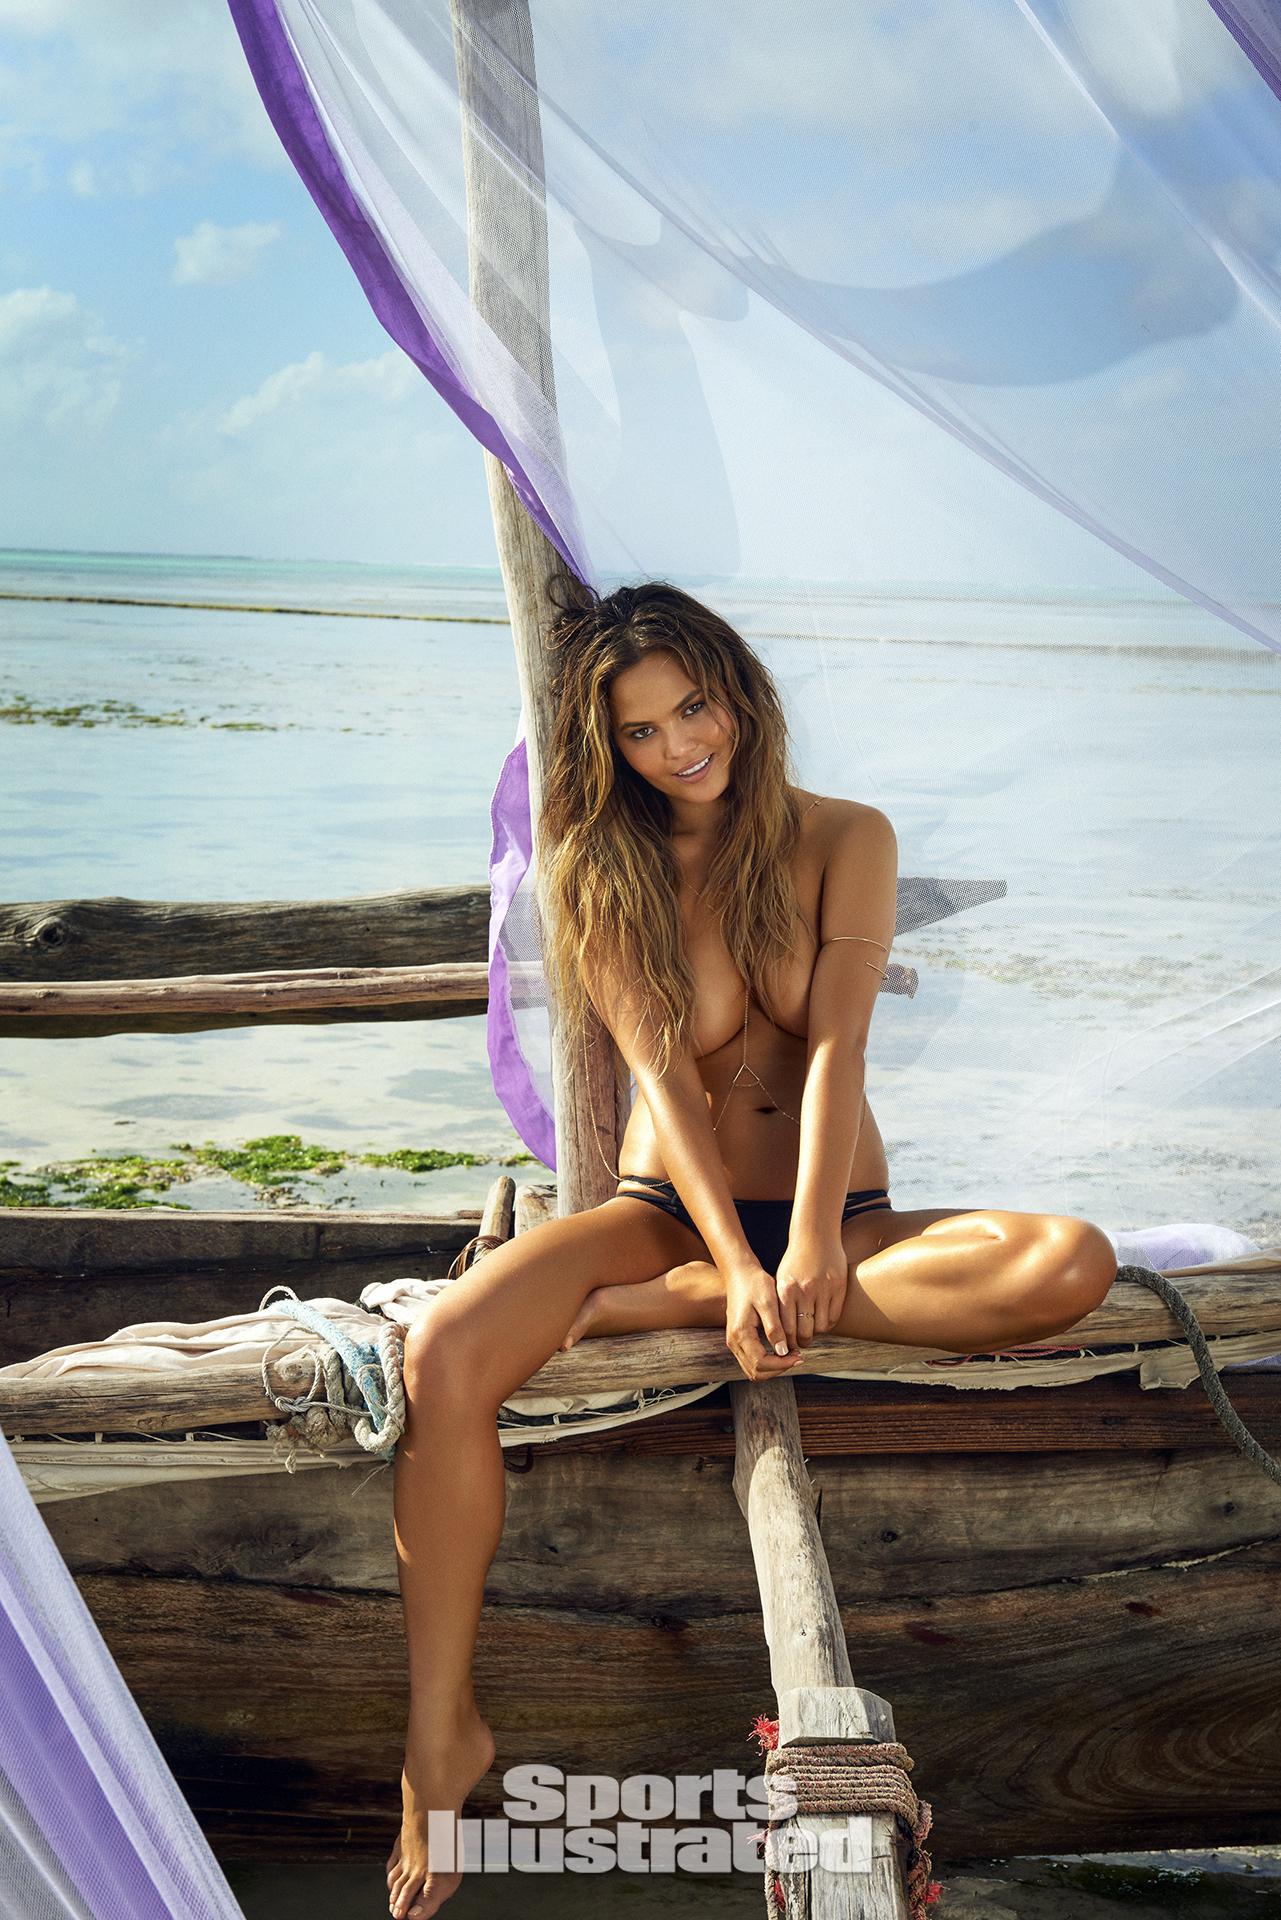 Chrissy Teigen was photographed by Ruven Afanador in Zanzibar. Swimsuit by MIKOH.